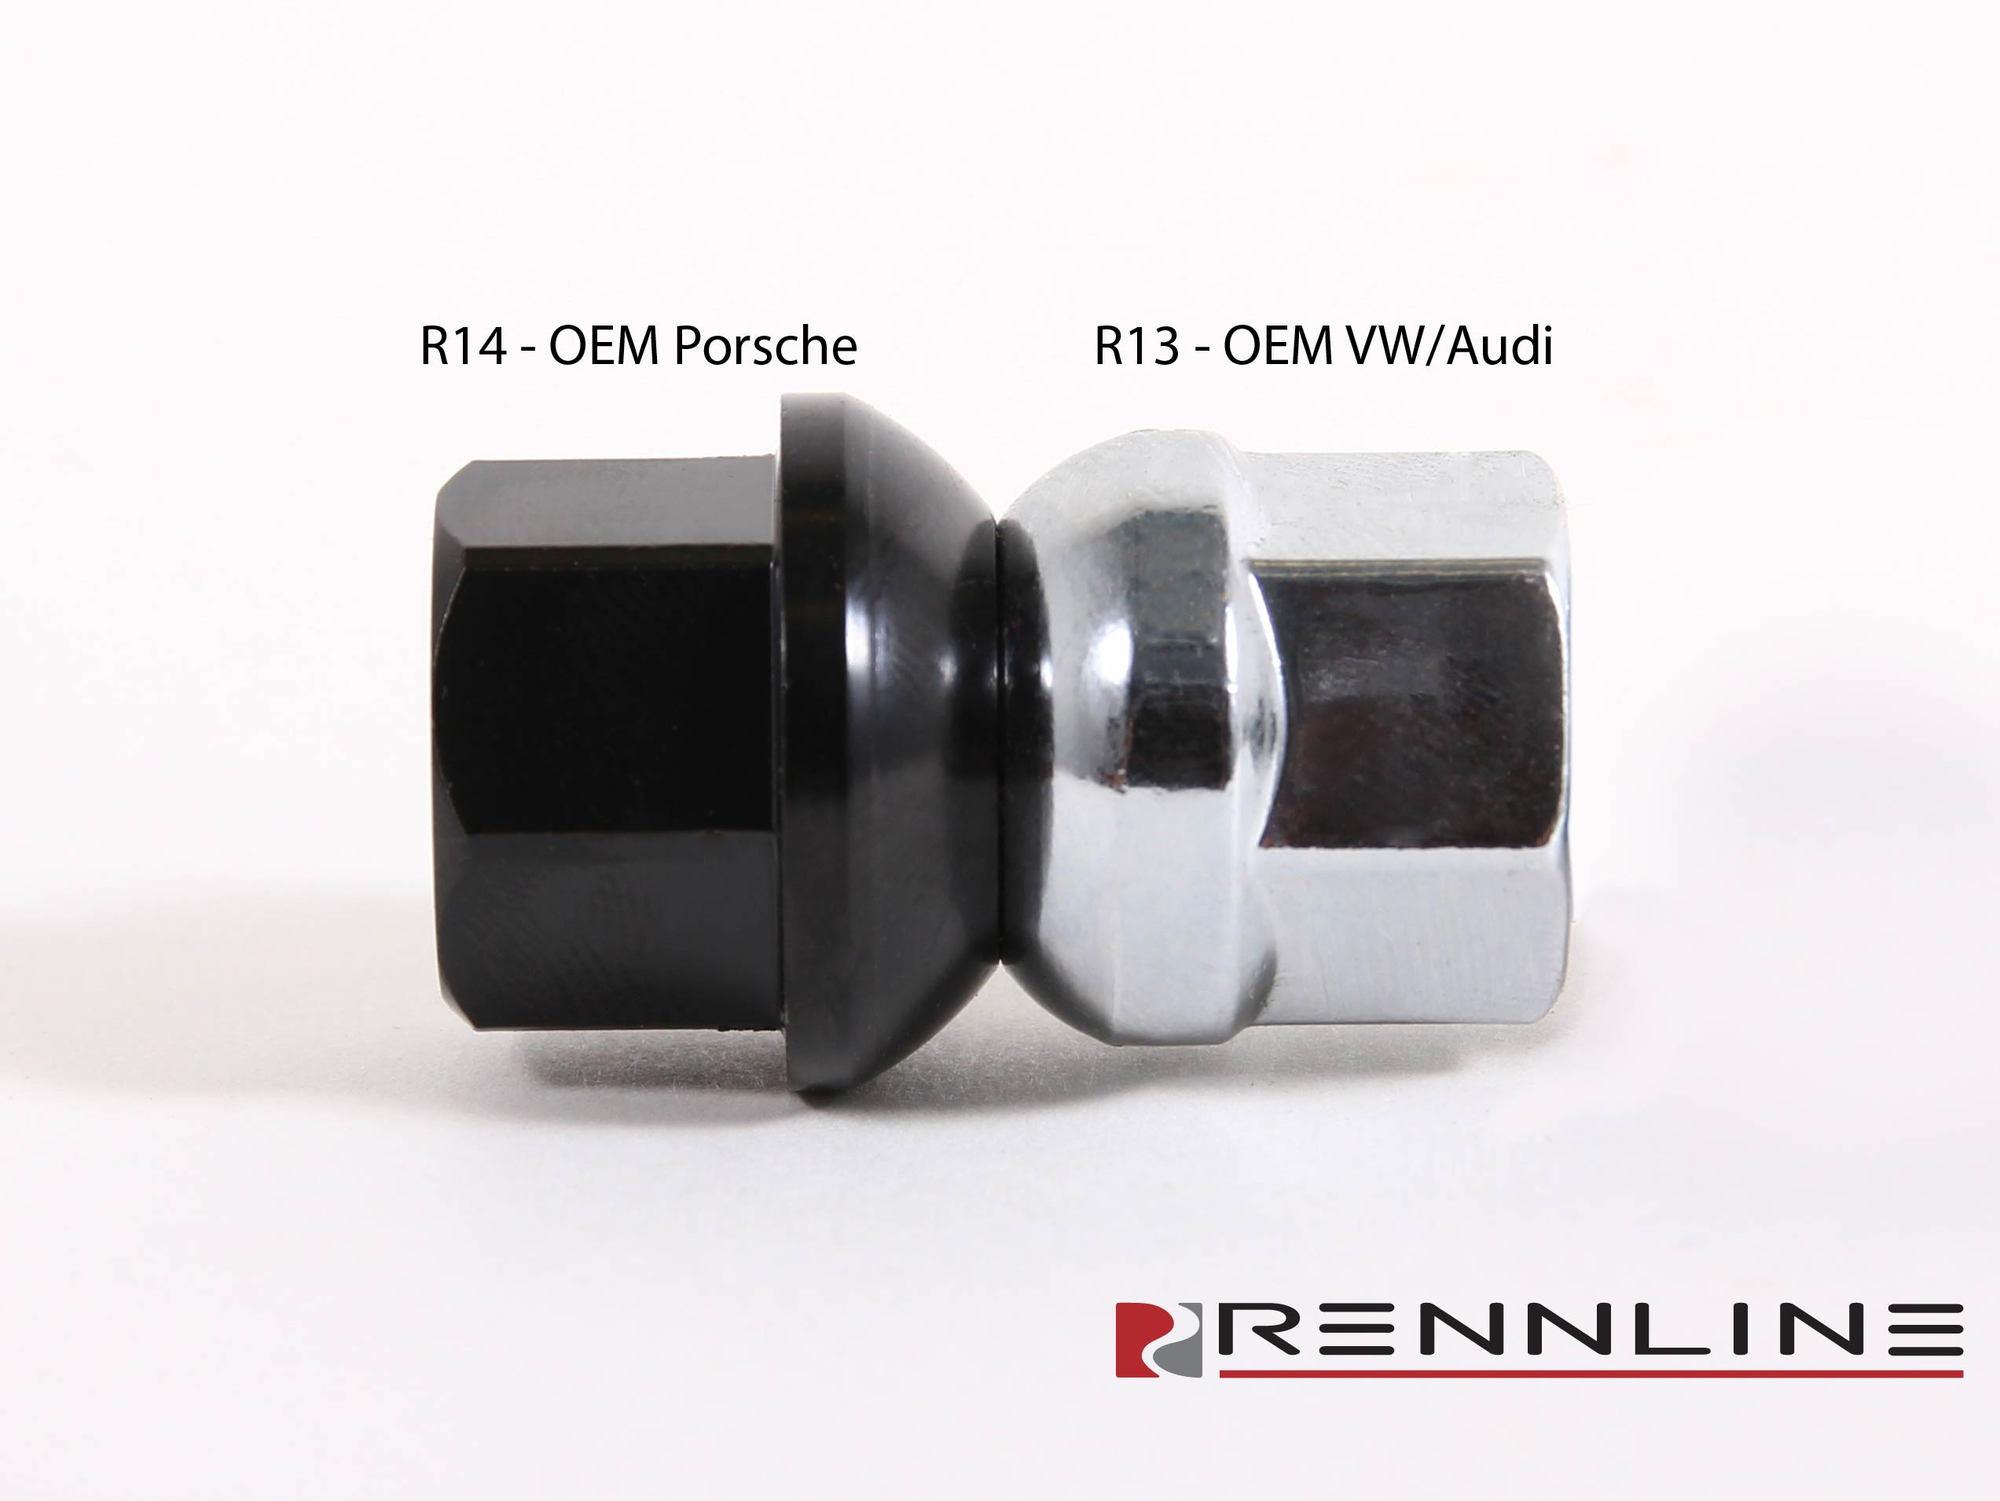 Porsche 20 MM Hub Centric Wheel Spacers OEM Extended Lug Bolts Black 14x1.5 R14